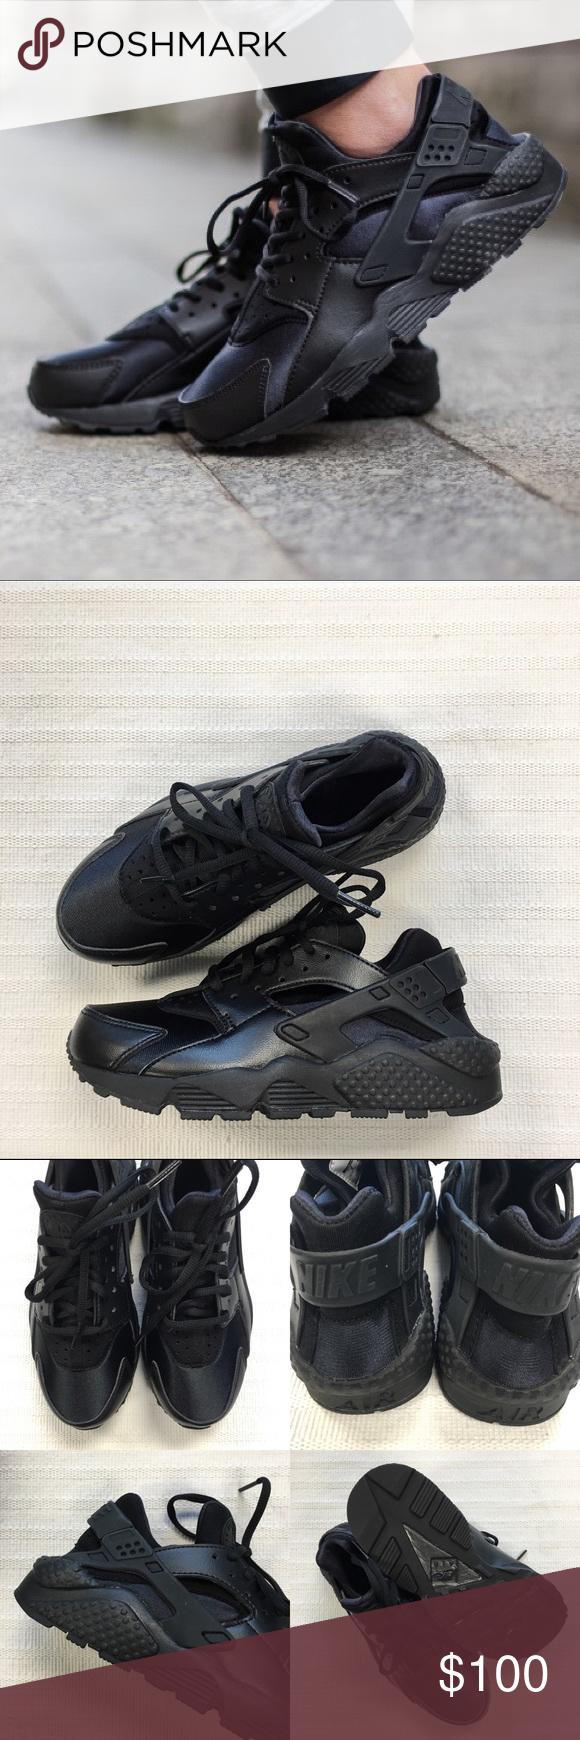 64ad0b8bf3cb Women s Nike Air Huarache Running Sneakers Women s Nike Air Huarache  Running Sneakers Style Color